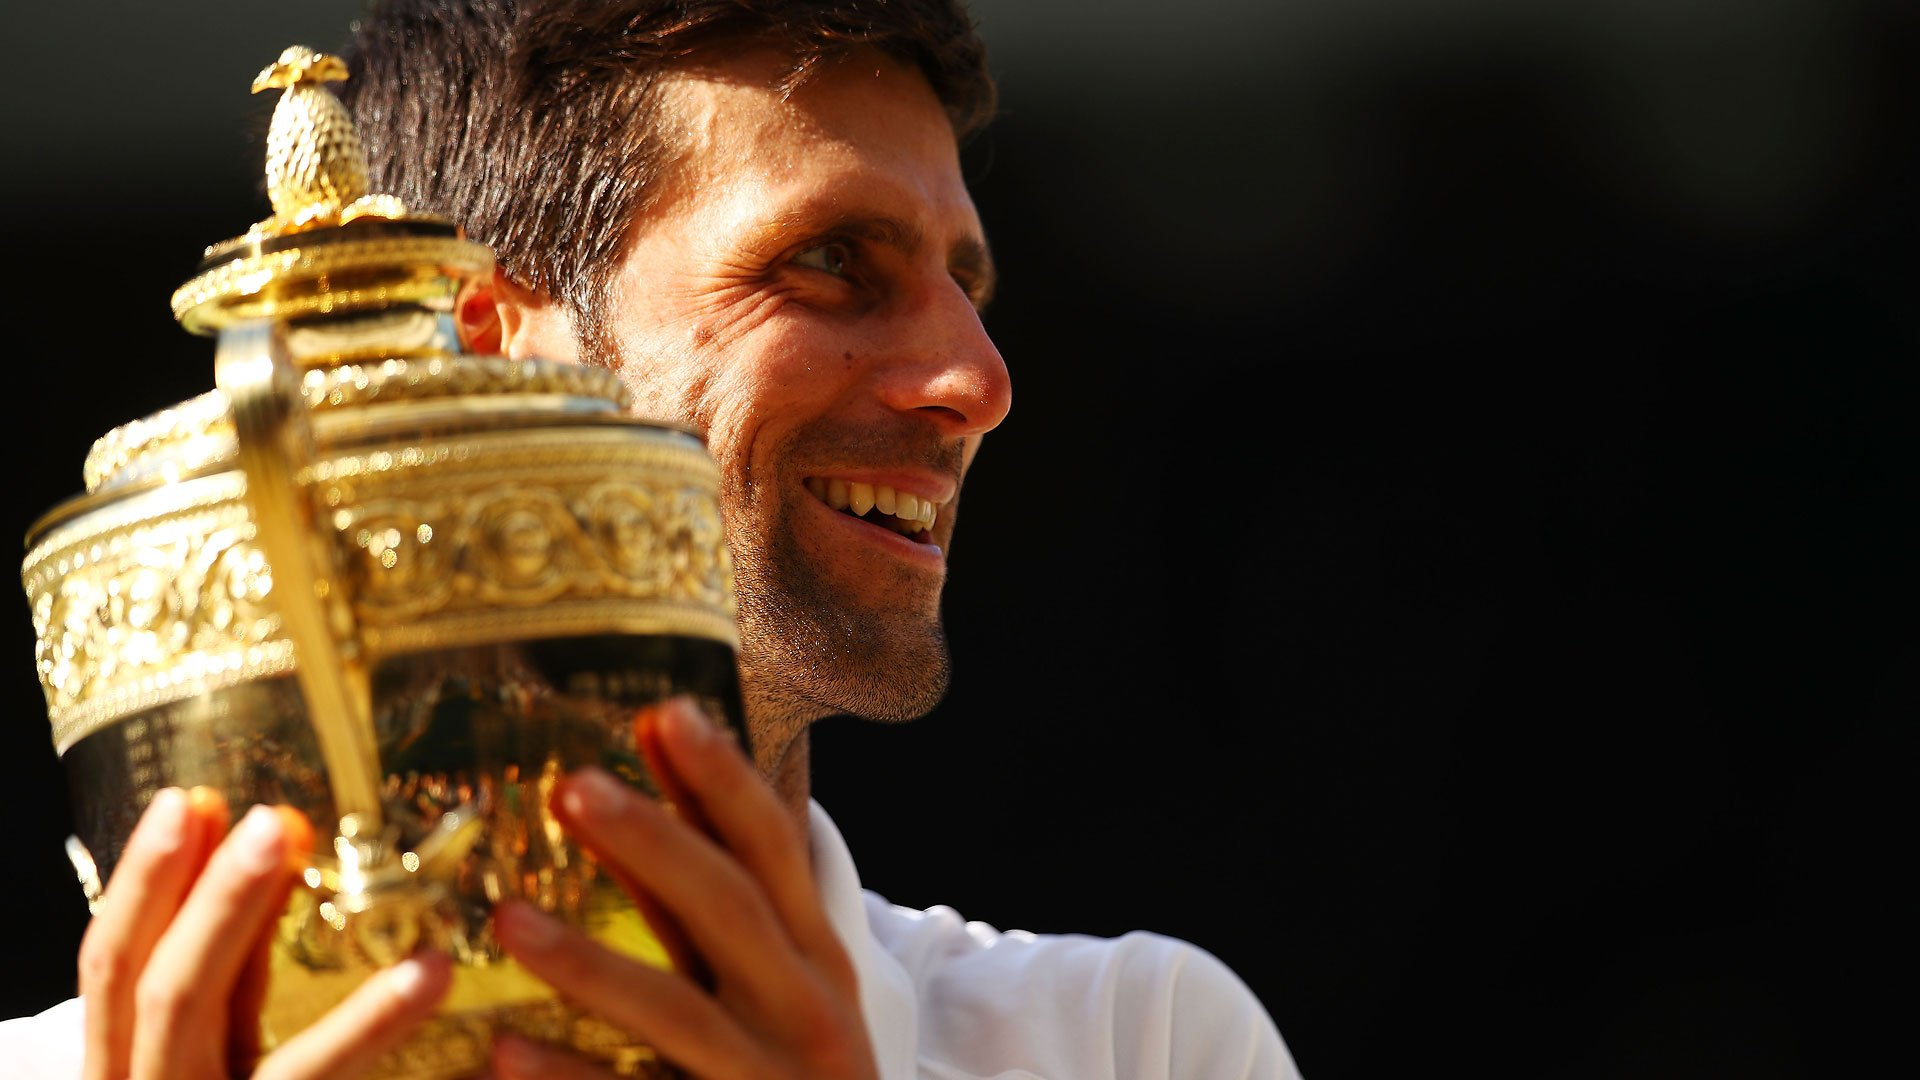 How did Twitter react to Novak Djokovic's fourth #Wimbledon ��?  Read More ▶️ https://t.co/Alz9DSmTai https://t.co/4m0h11nsWE